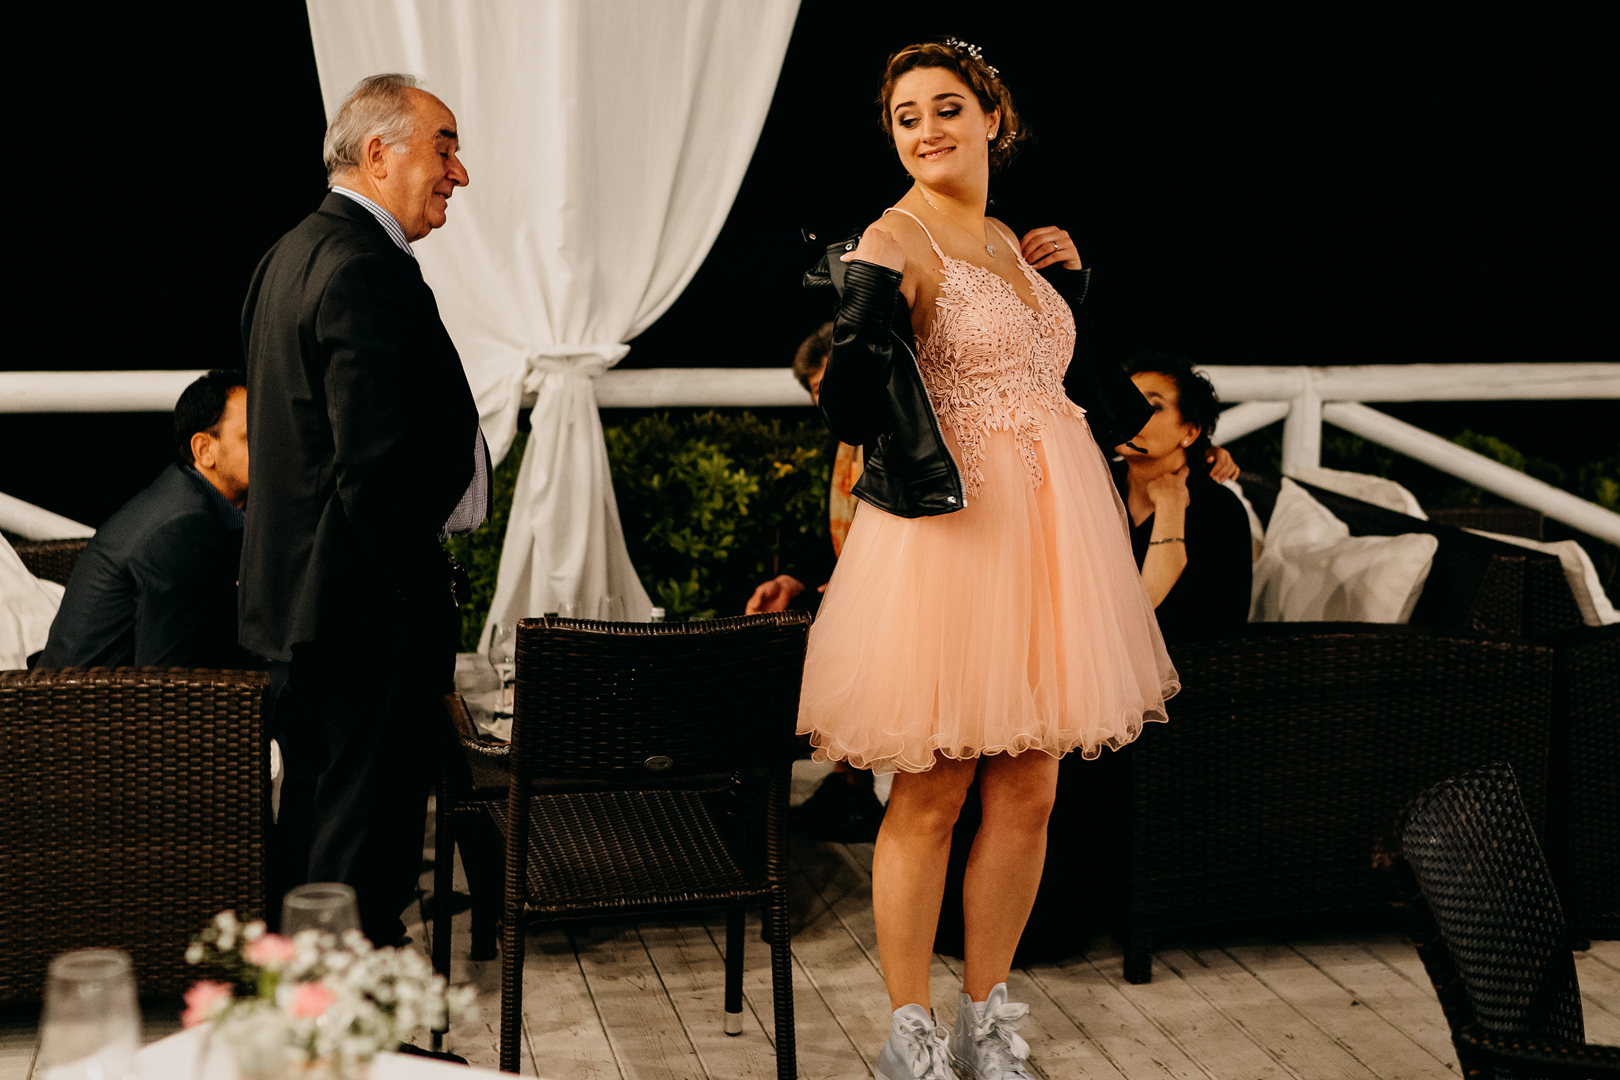 65 matrimonio-wedding-cambio-abito-sposa-mare-residence-il-porto-gianni-lepore